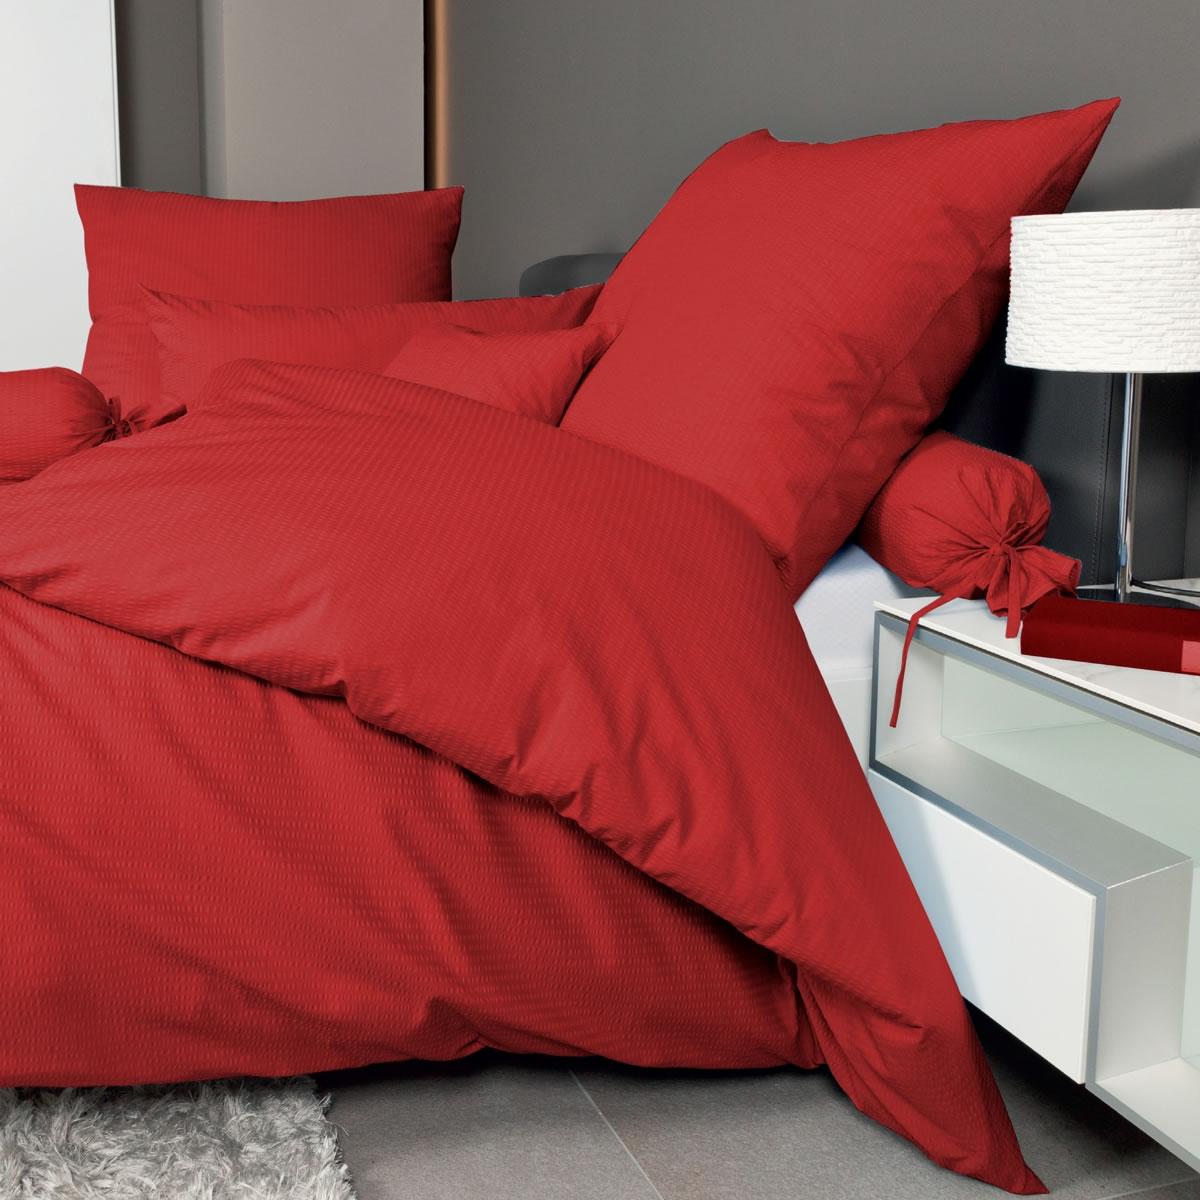 janine uni mako soft seersucker bettw sche 0125 piano 200x200 200x220 240x220 ebay. Black Bedroom Furniture Sets. Home Design Ideas